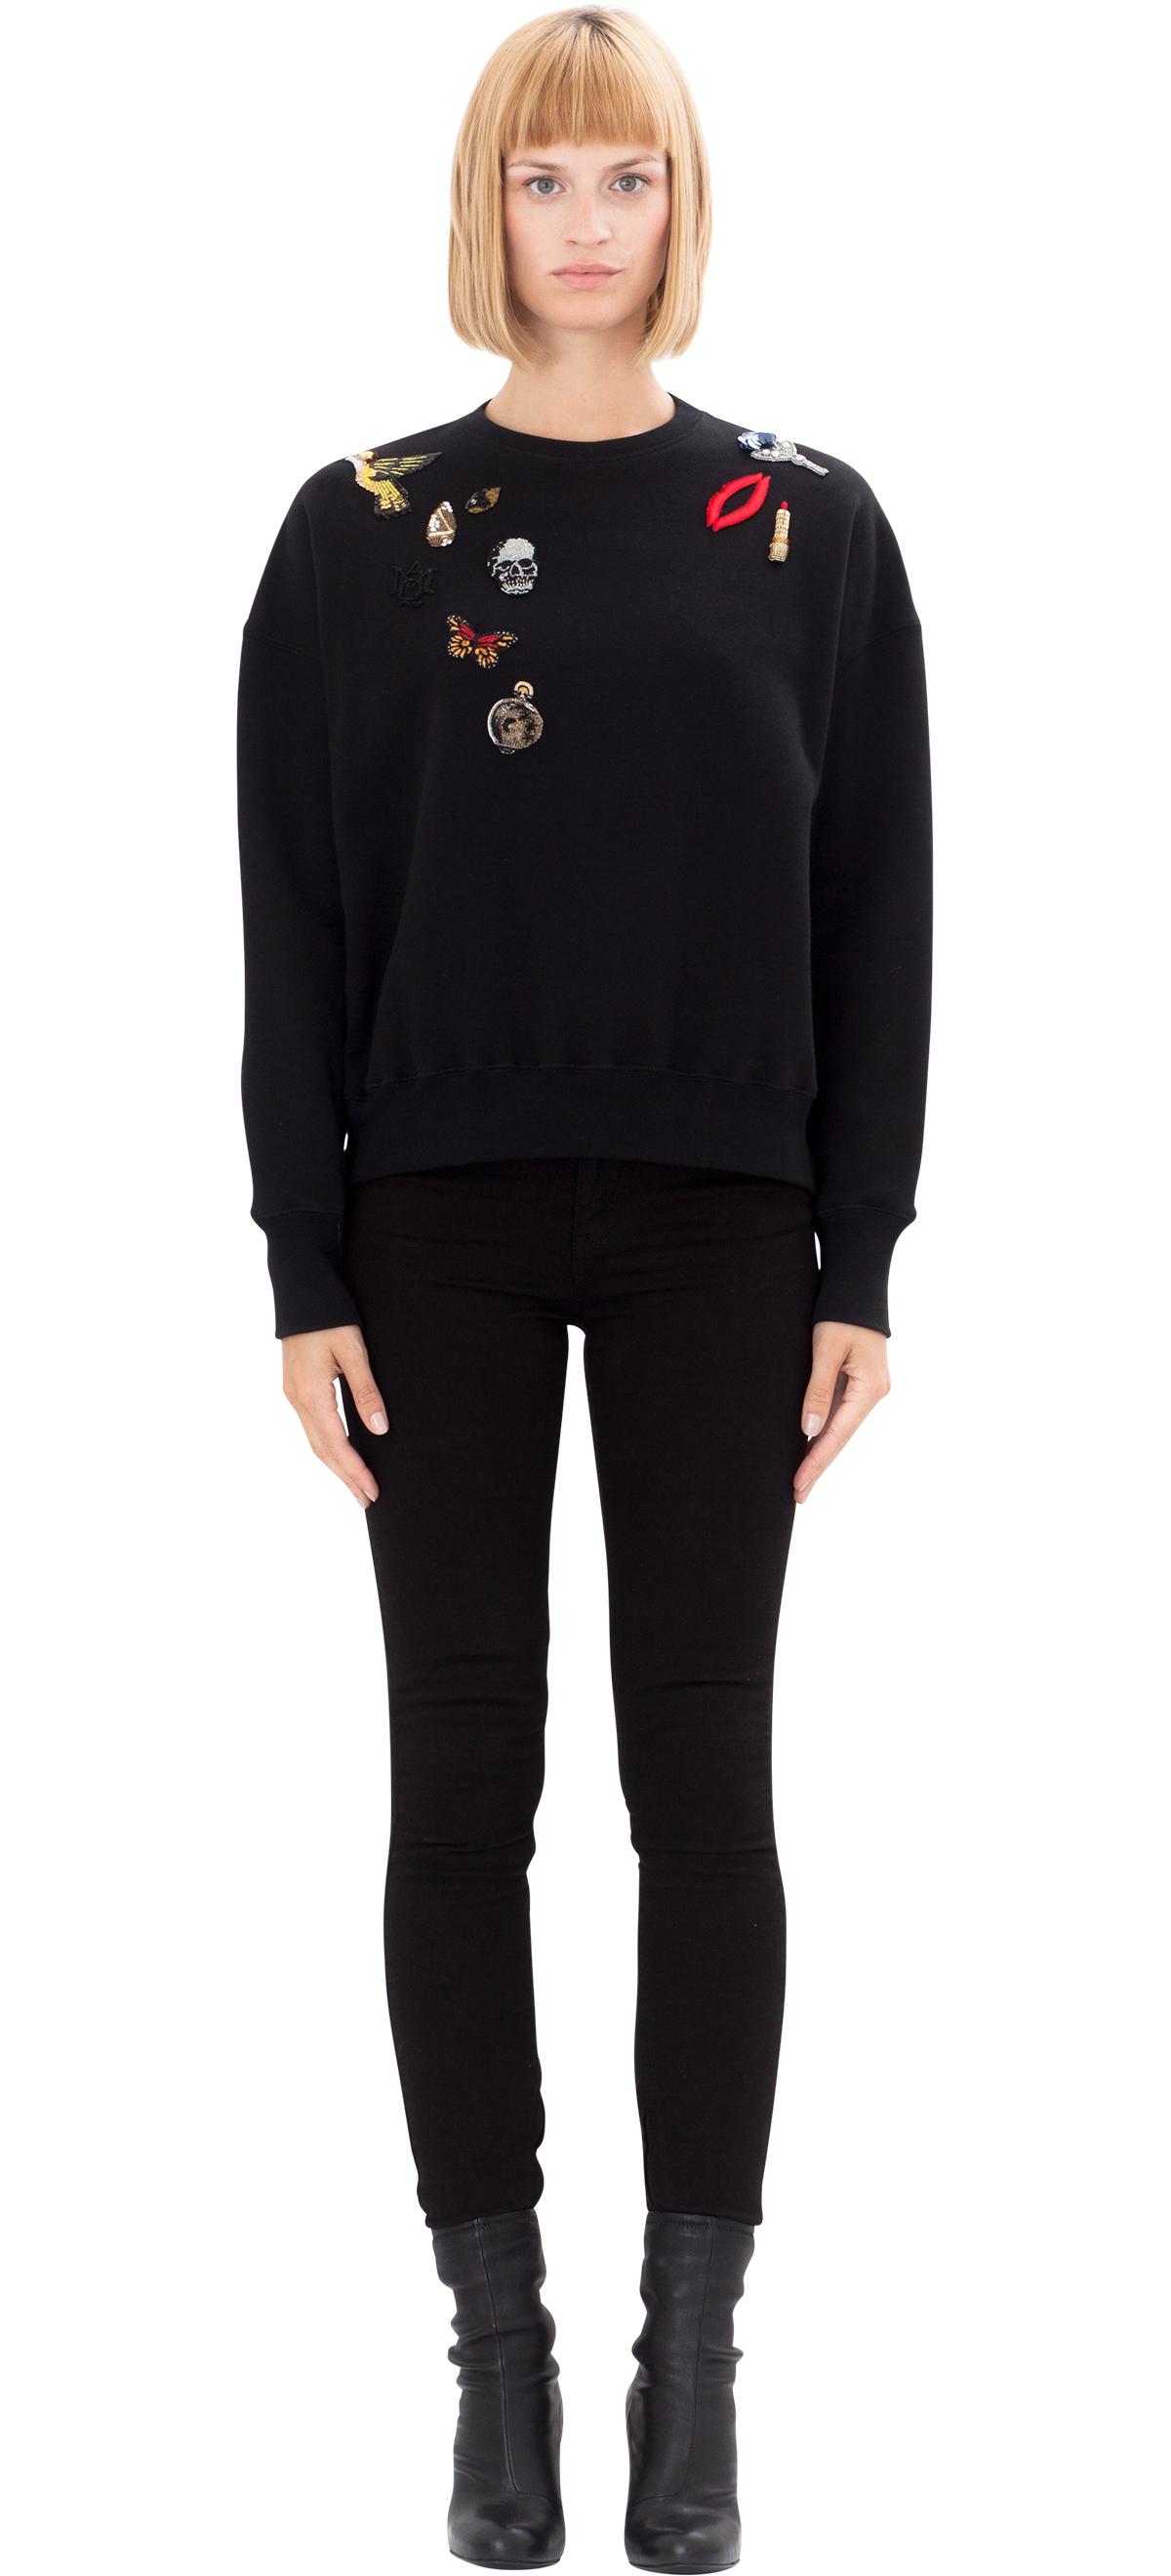 alexander mcqueen embroidered cotton sweatshirt in black lyst. Black Bedroom Furniture Sets. Home Design Ideas